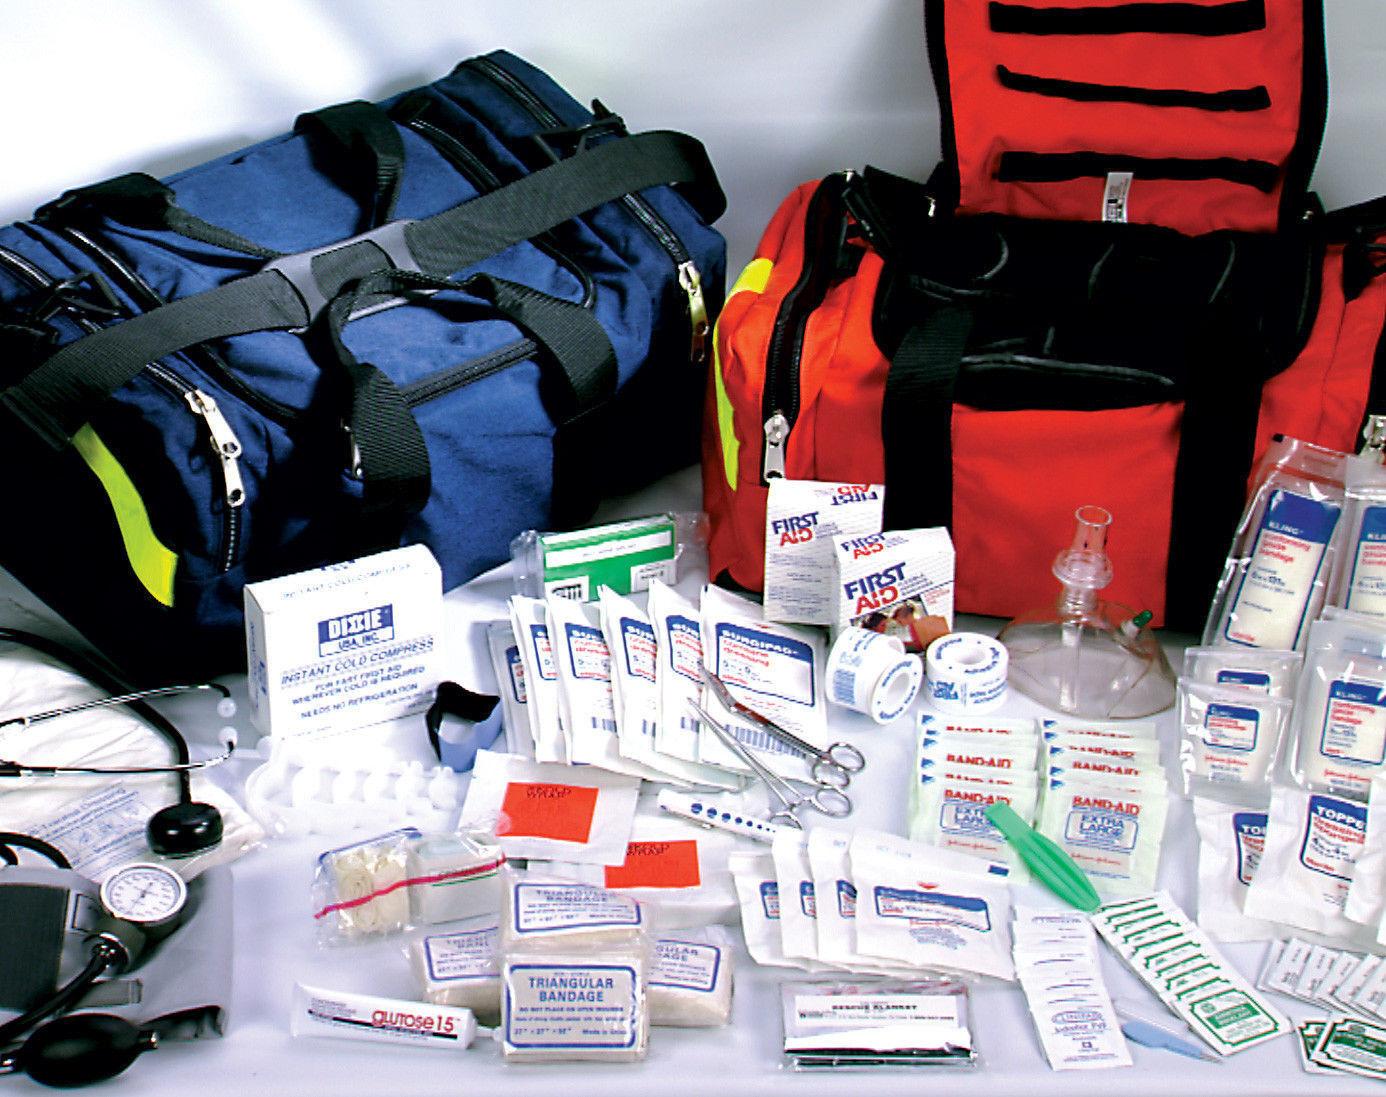 Best NEW FIRST RESPONDER PARAMEDIC TRAUMA EMERGENCY MEDICAL KIT FULLY STOCKED  NEW BAG